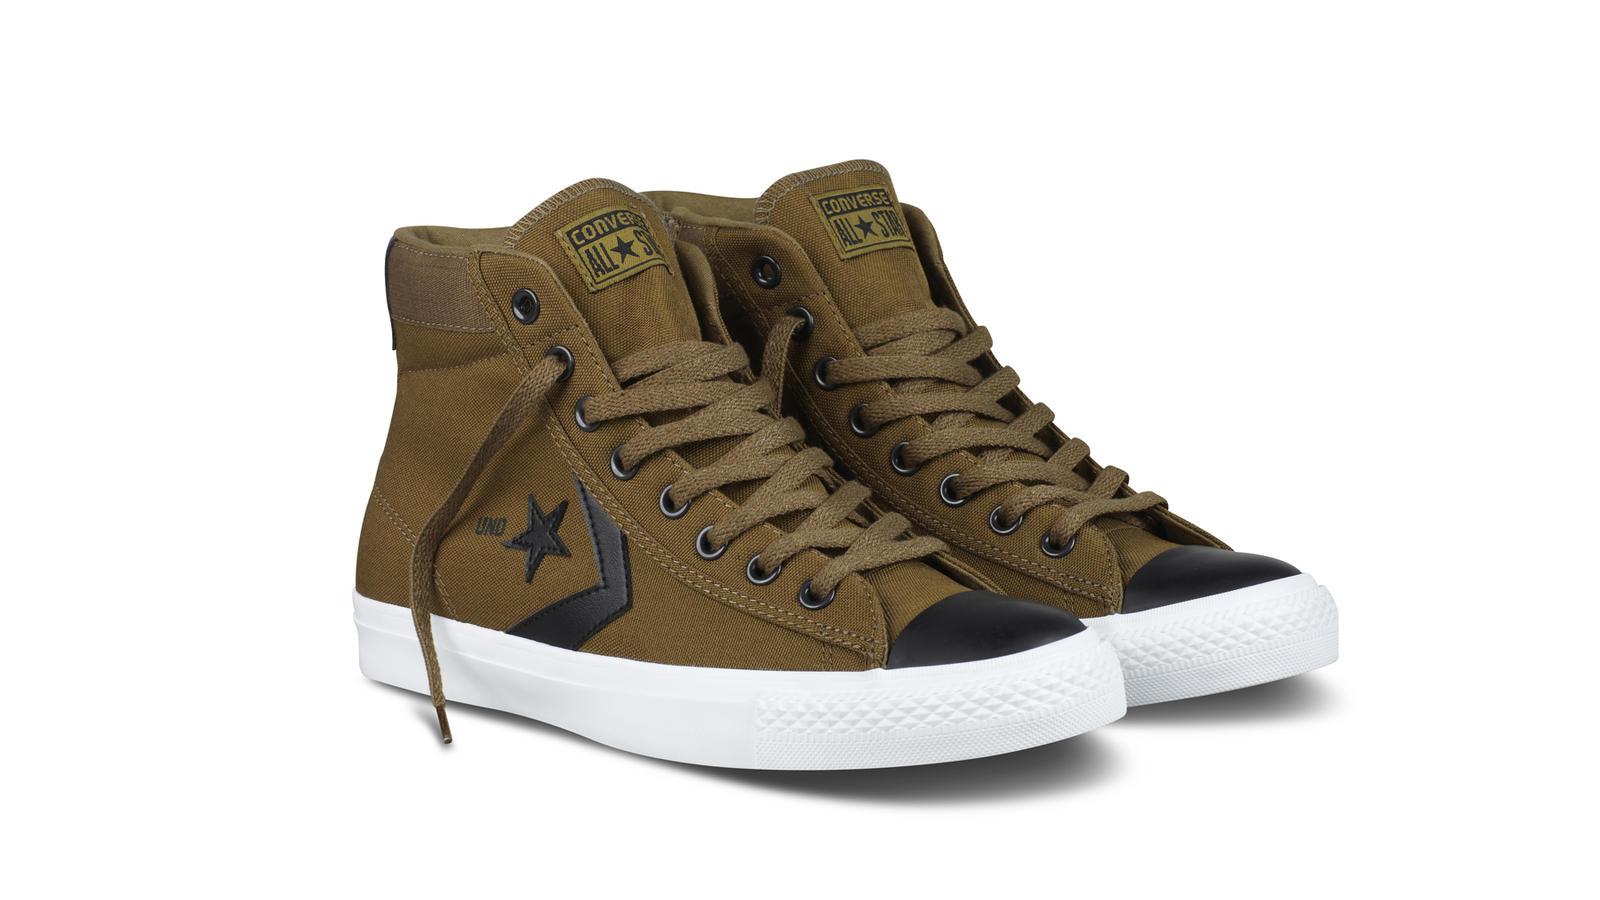 Foot Locker Converse : Converse | scarpe All Star e All Star